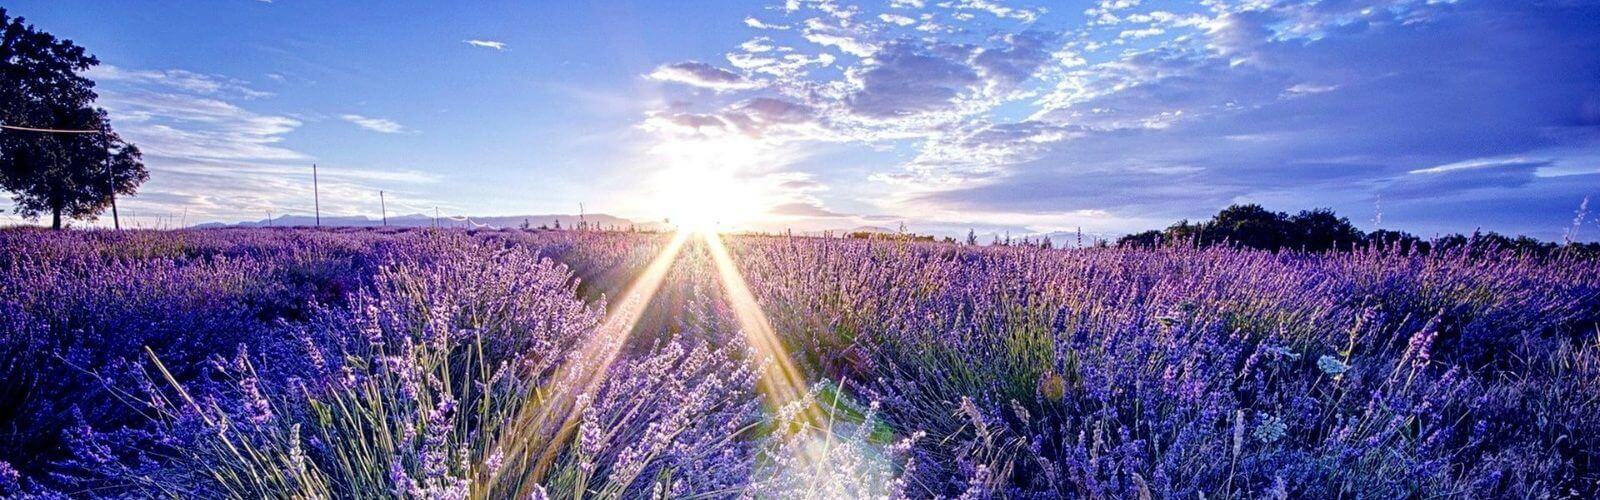 lavender-1-1600x500